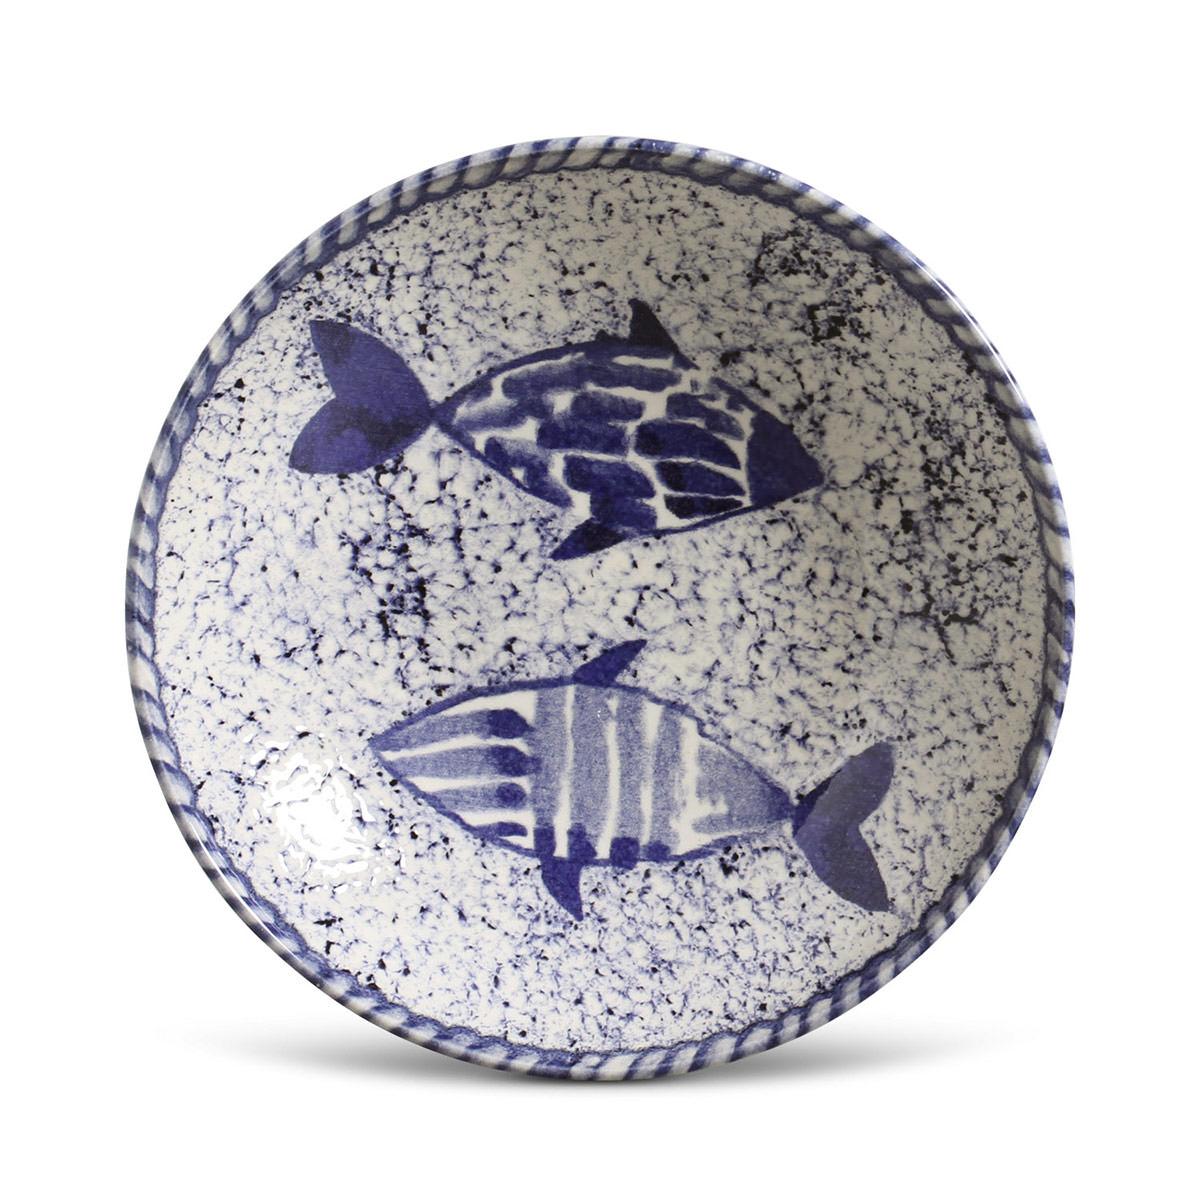 Jogo de Jantar Fish 18pçs - Porto Brasil